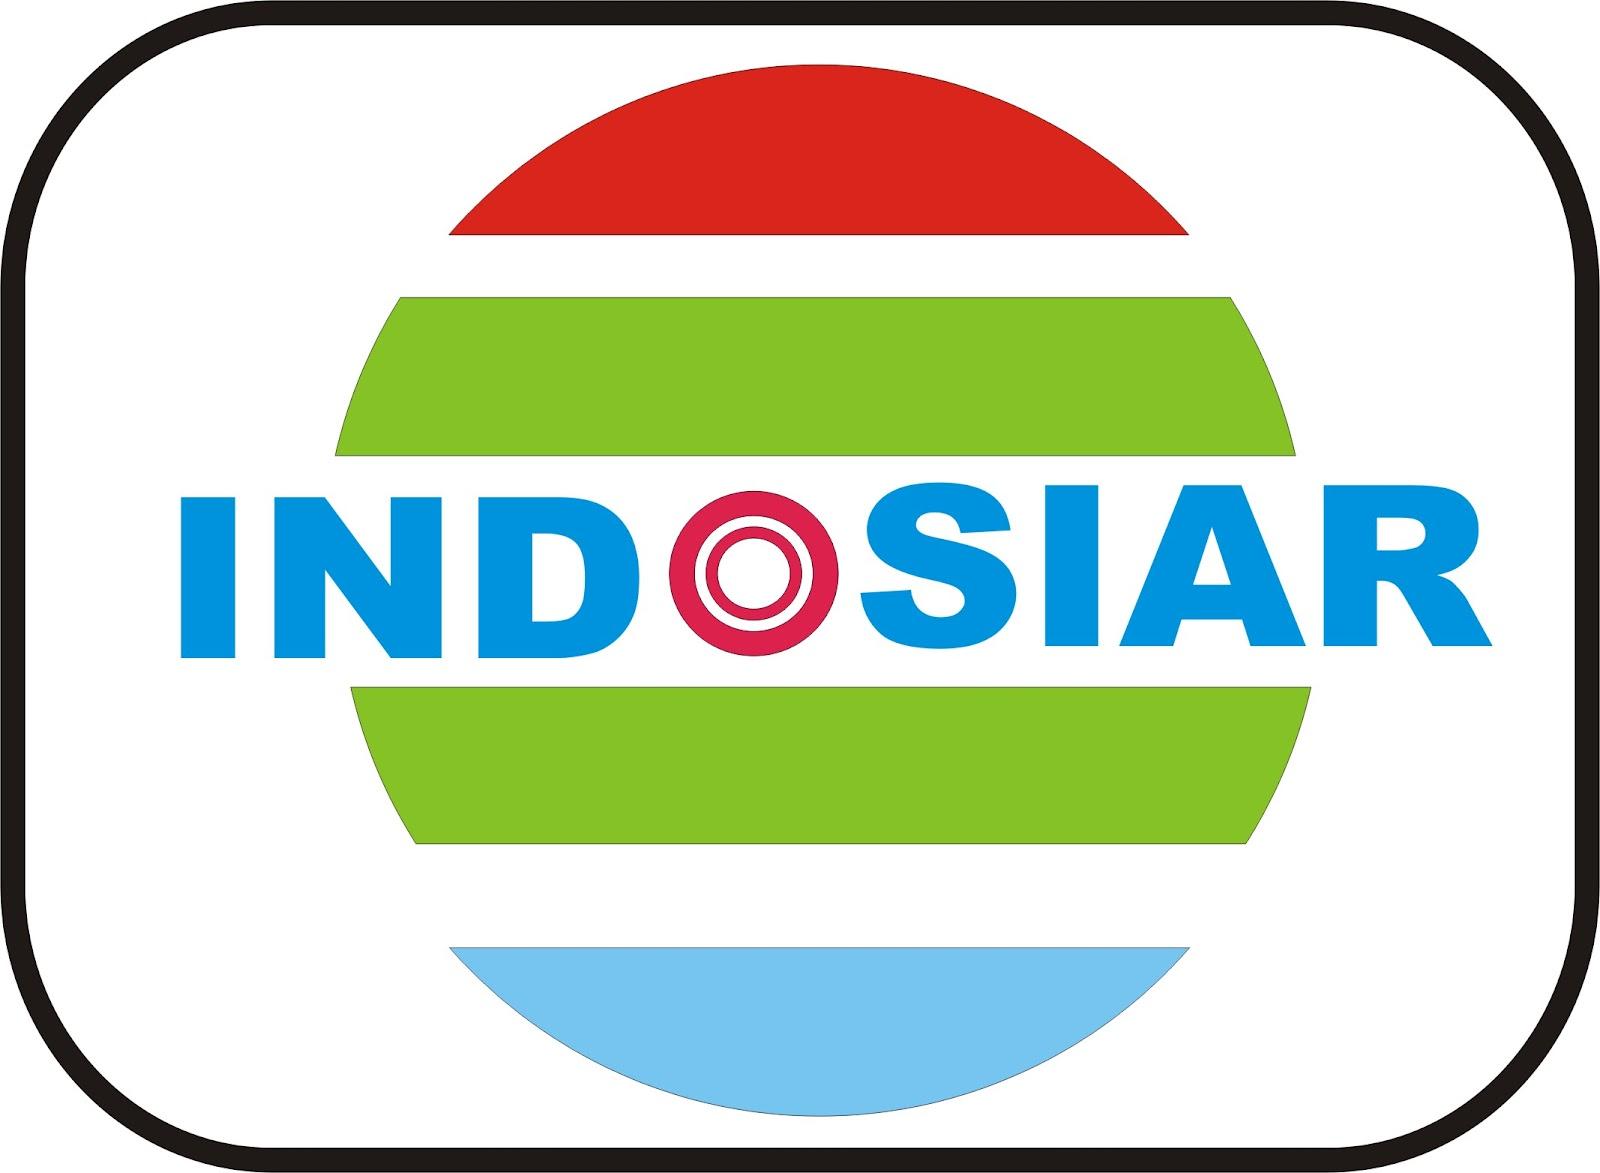 Indosiar Streaming Facebook: All Story About Yuni: Langkah-Langkah Membuat Logo INDOSIAR